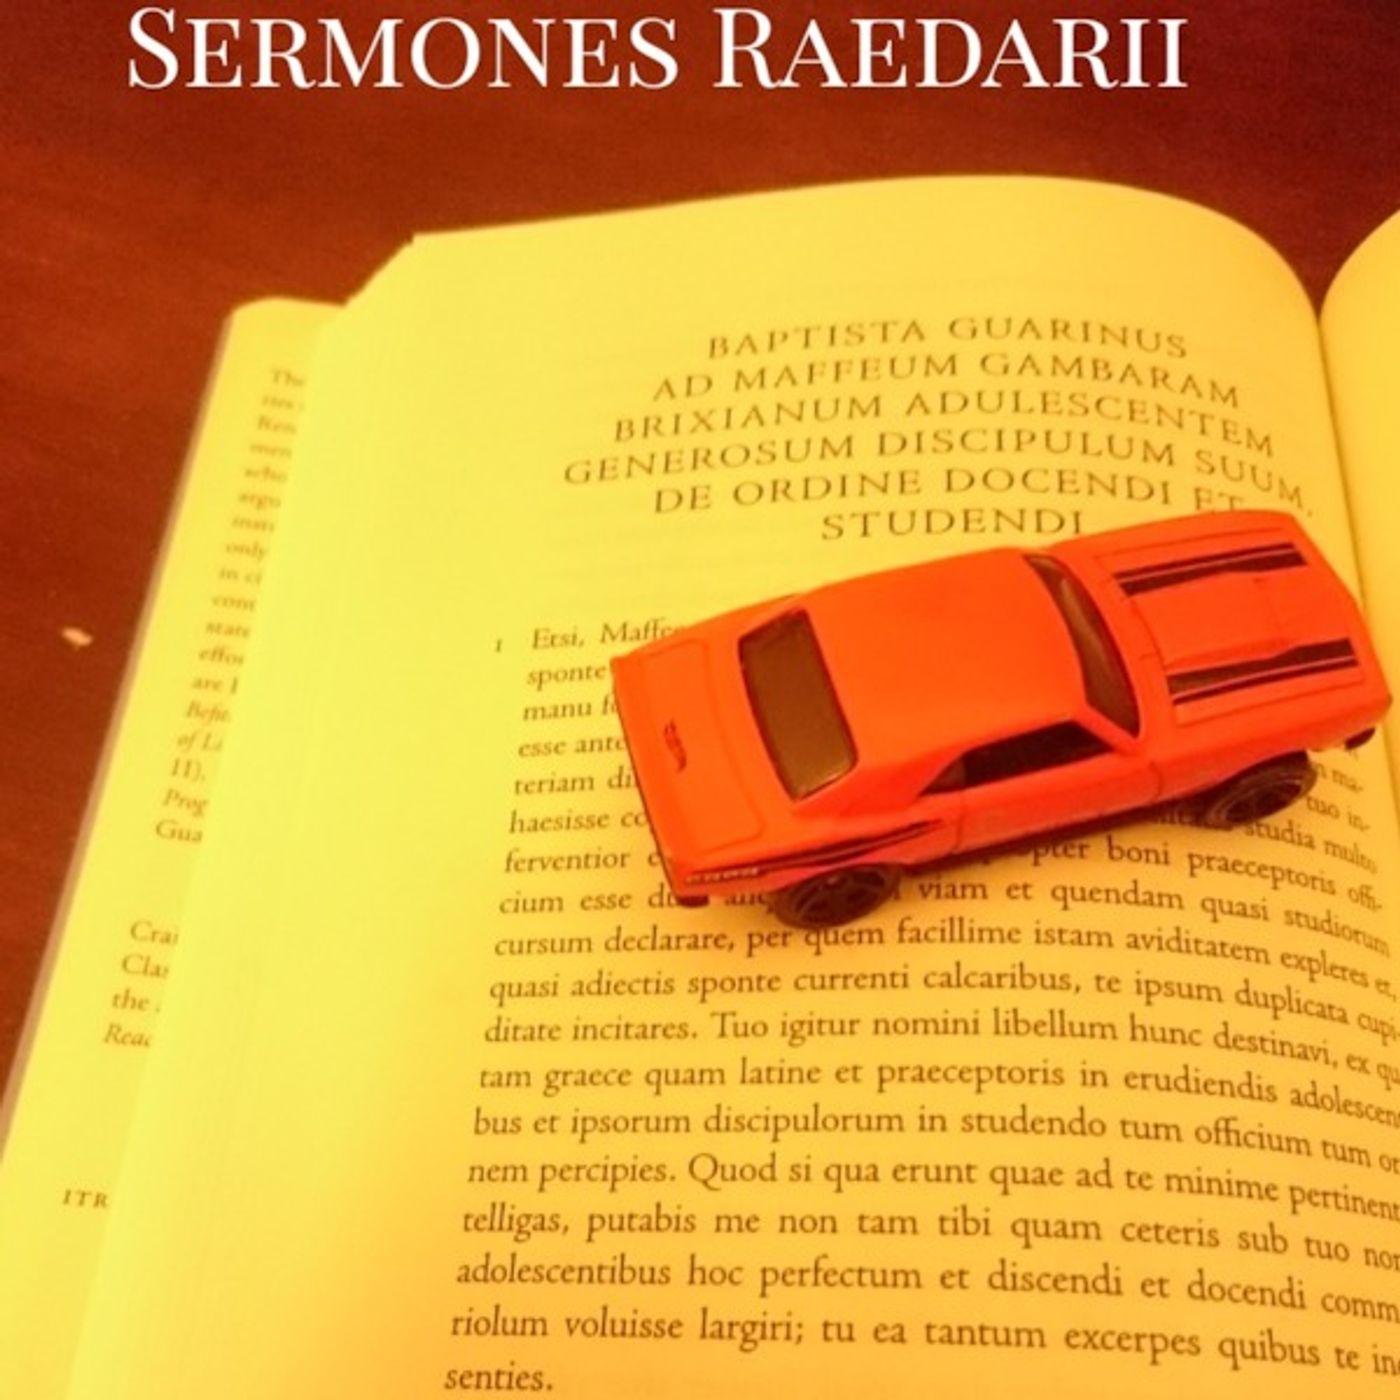 Sermo Raedarius 113 - Vale Italia pars 4